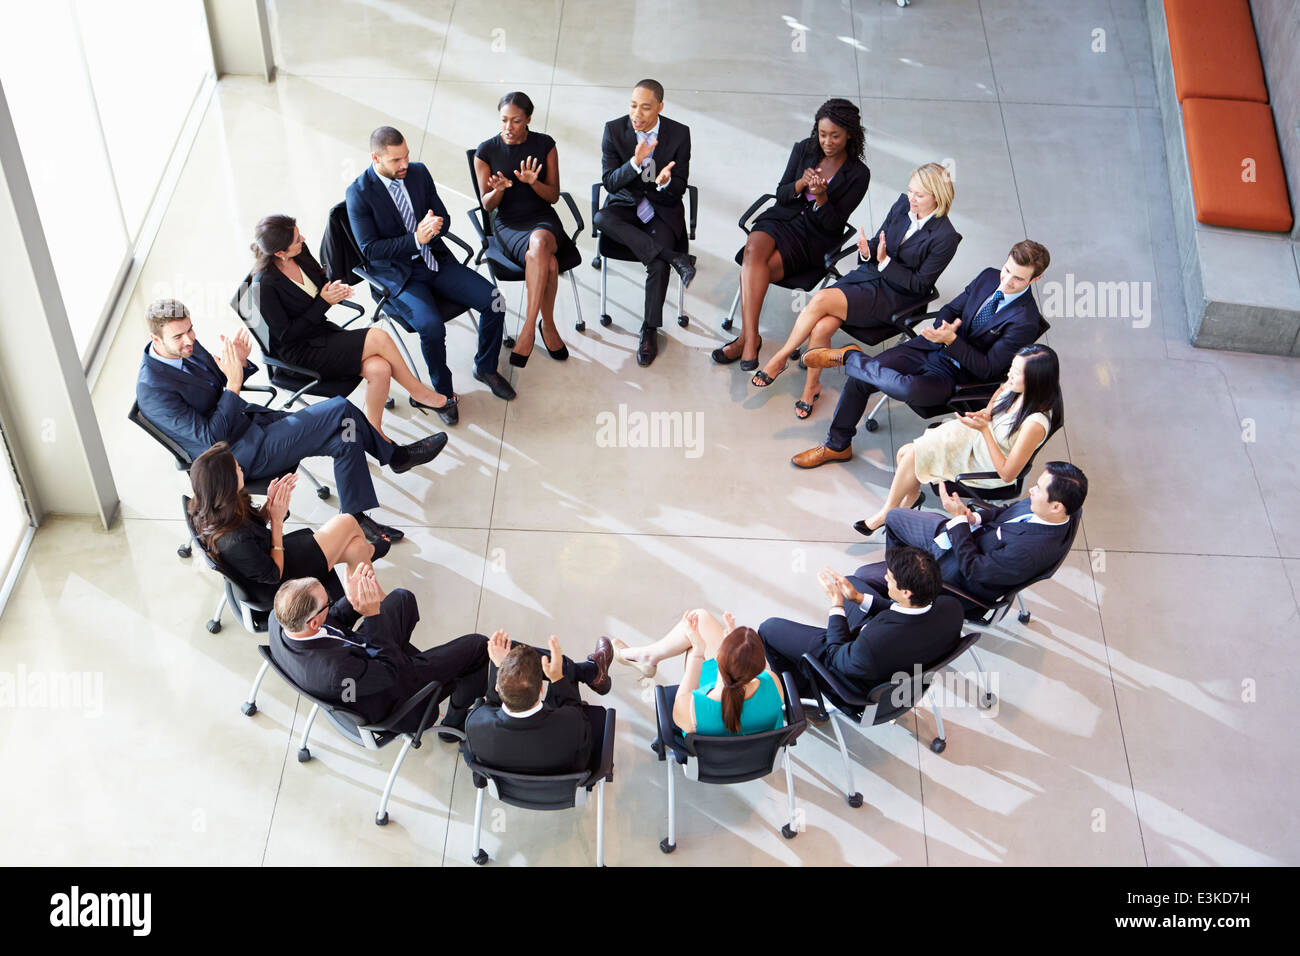 Multi-Cultural Personnel de bureau applaudir au cours de réunion Photo Stock